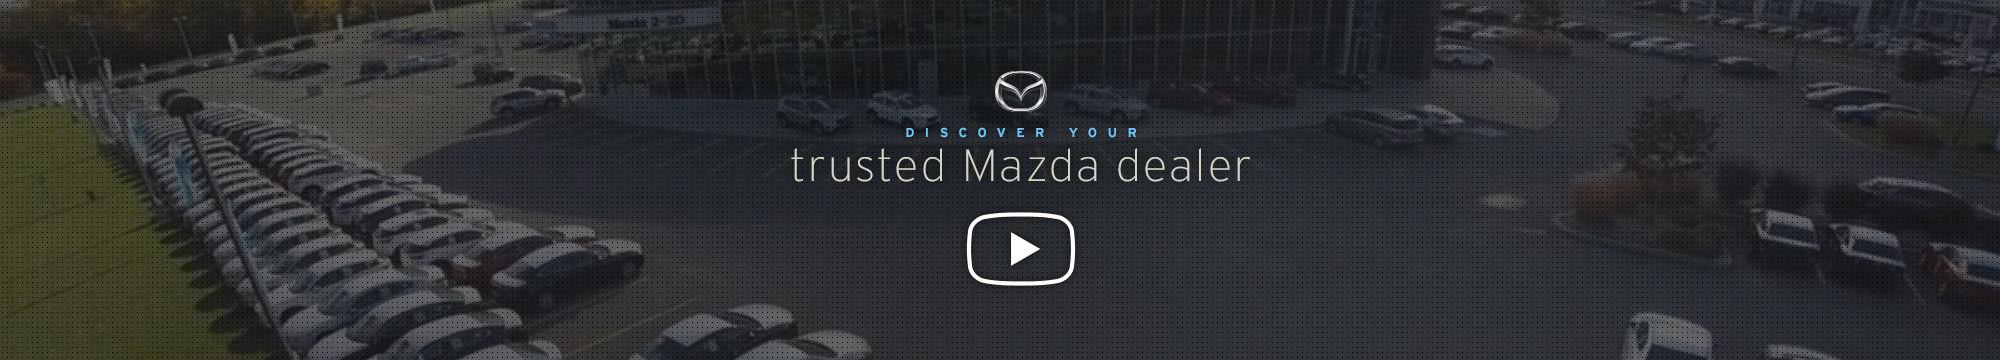 Trusted Mazda dealer